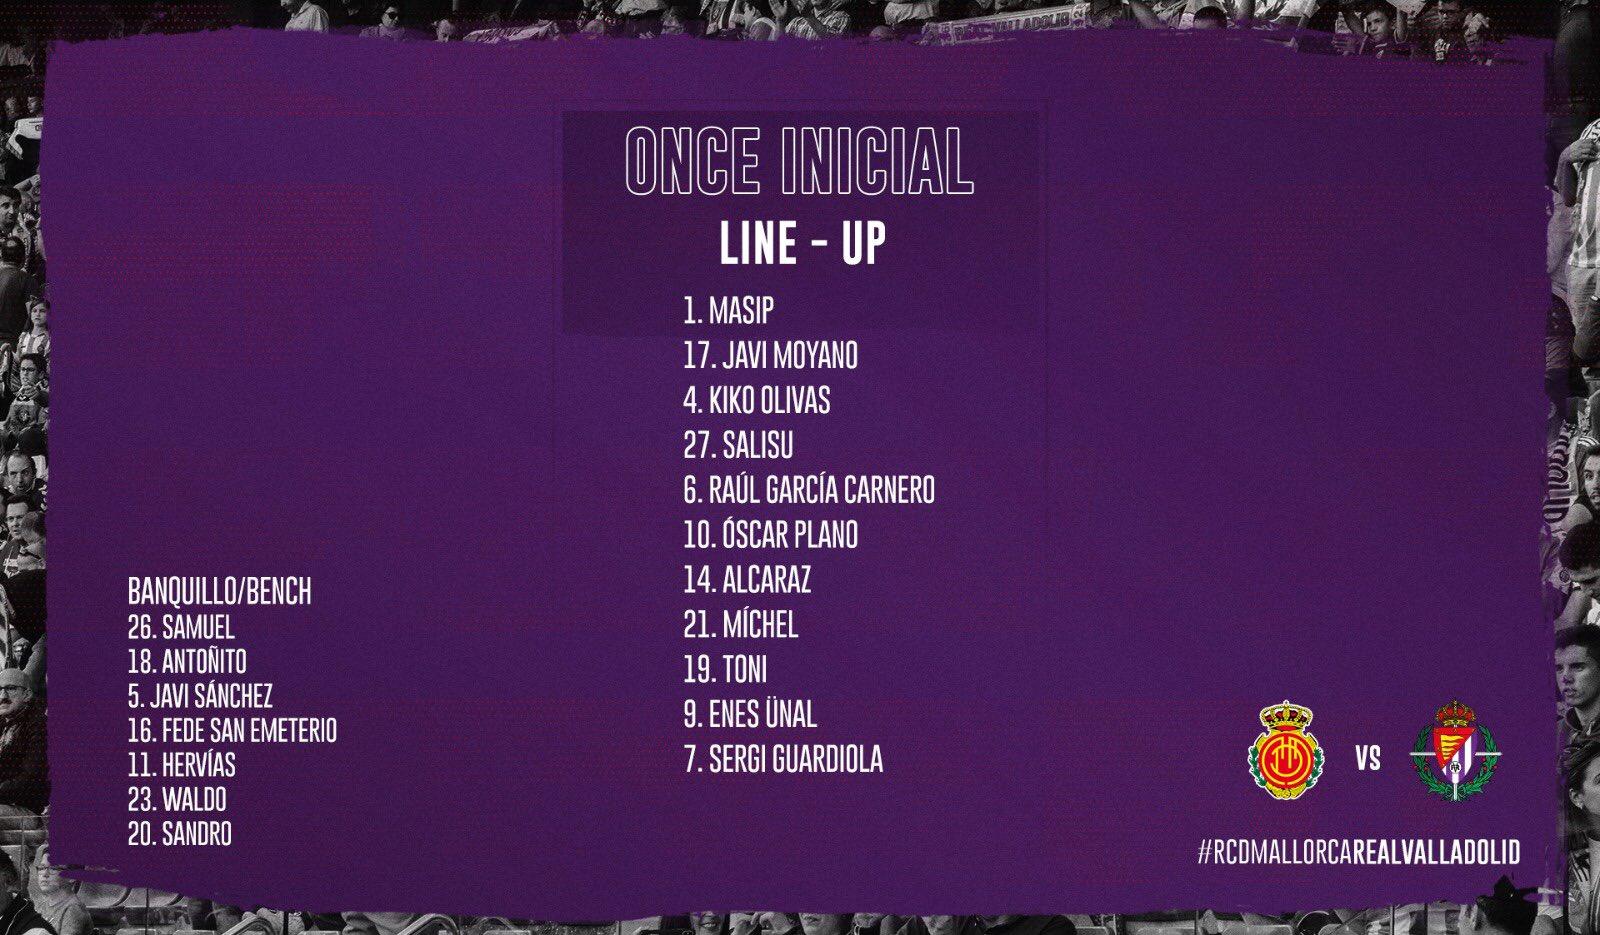 R.C.D. Mallorca - Real Valladolid C.F. Sábado 1 de Febrero. 18:30 IMG-20200201-172013